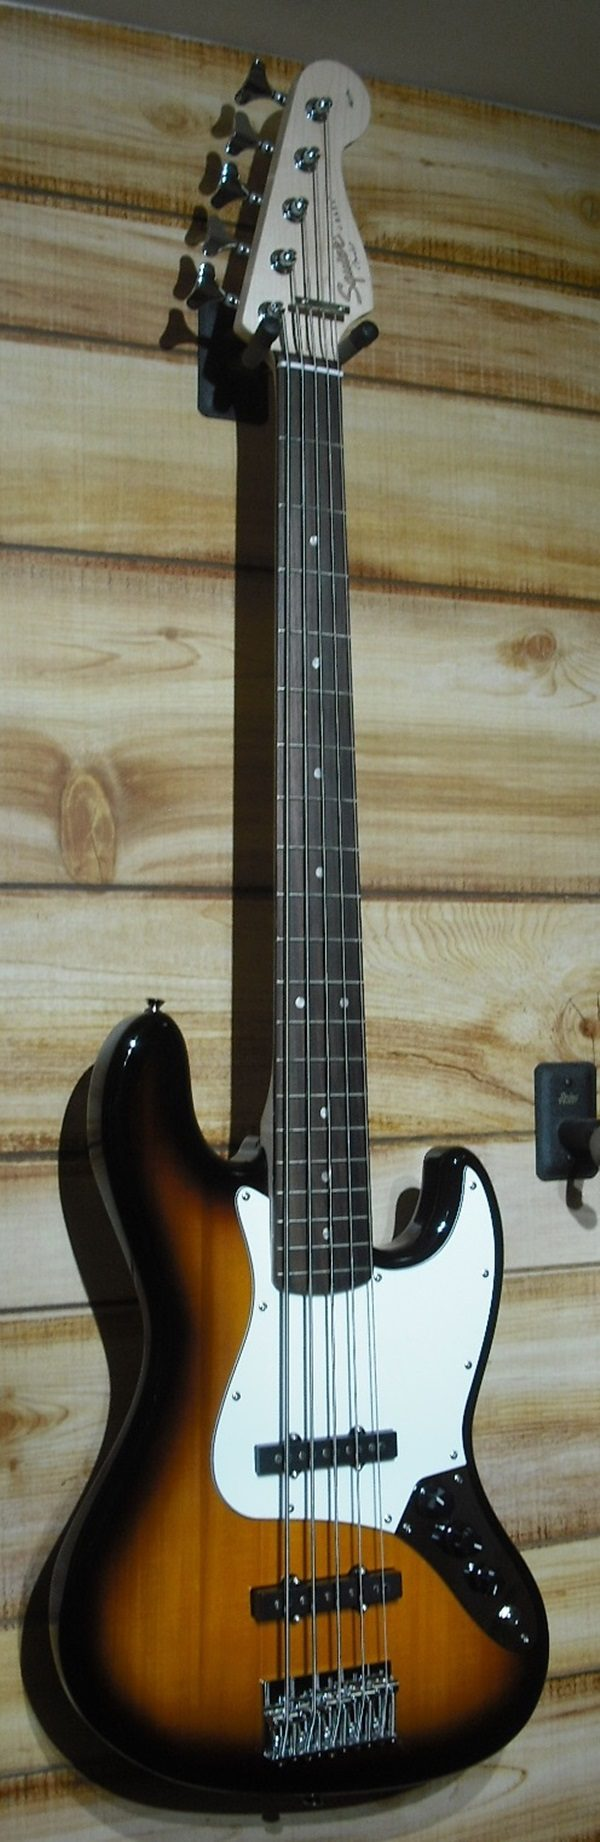 Squier® Affinity Jazz Bass® V Rosewood Fingerboard Brown Sunburst